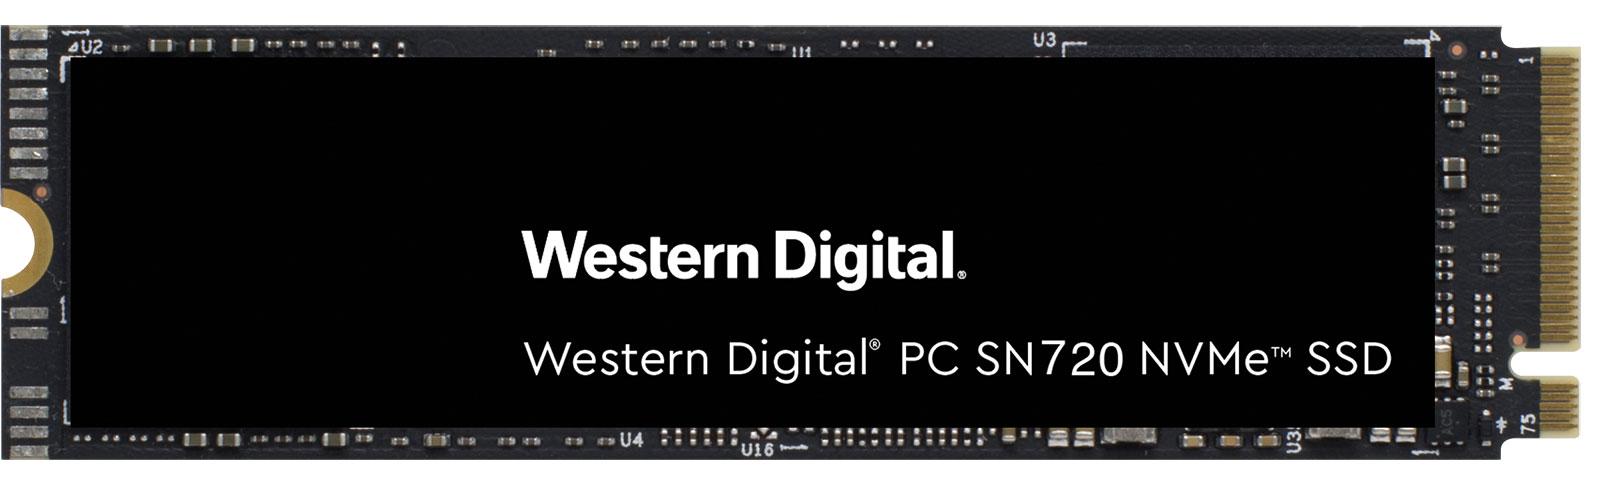 WD-PC-SN720